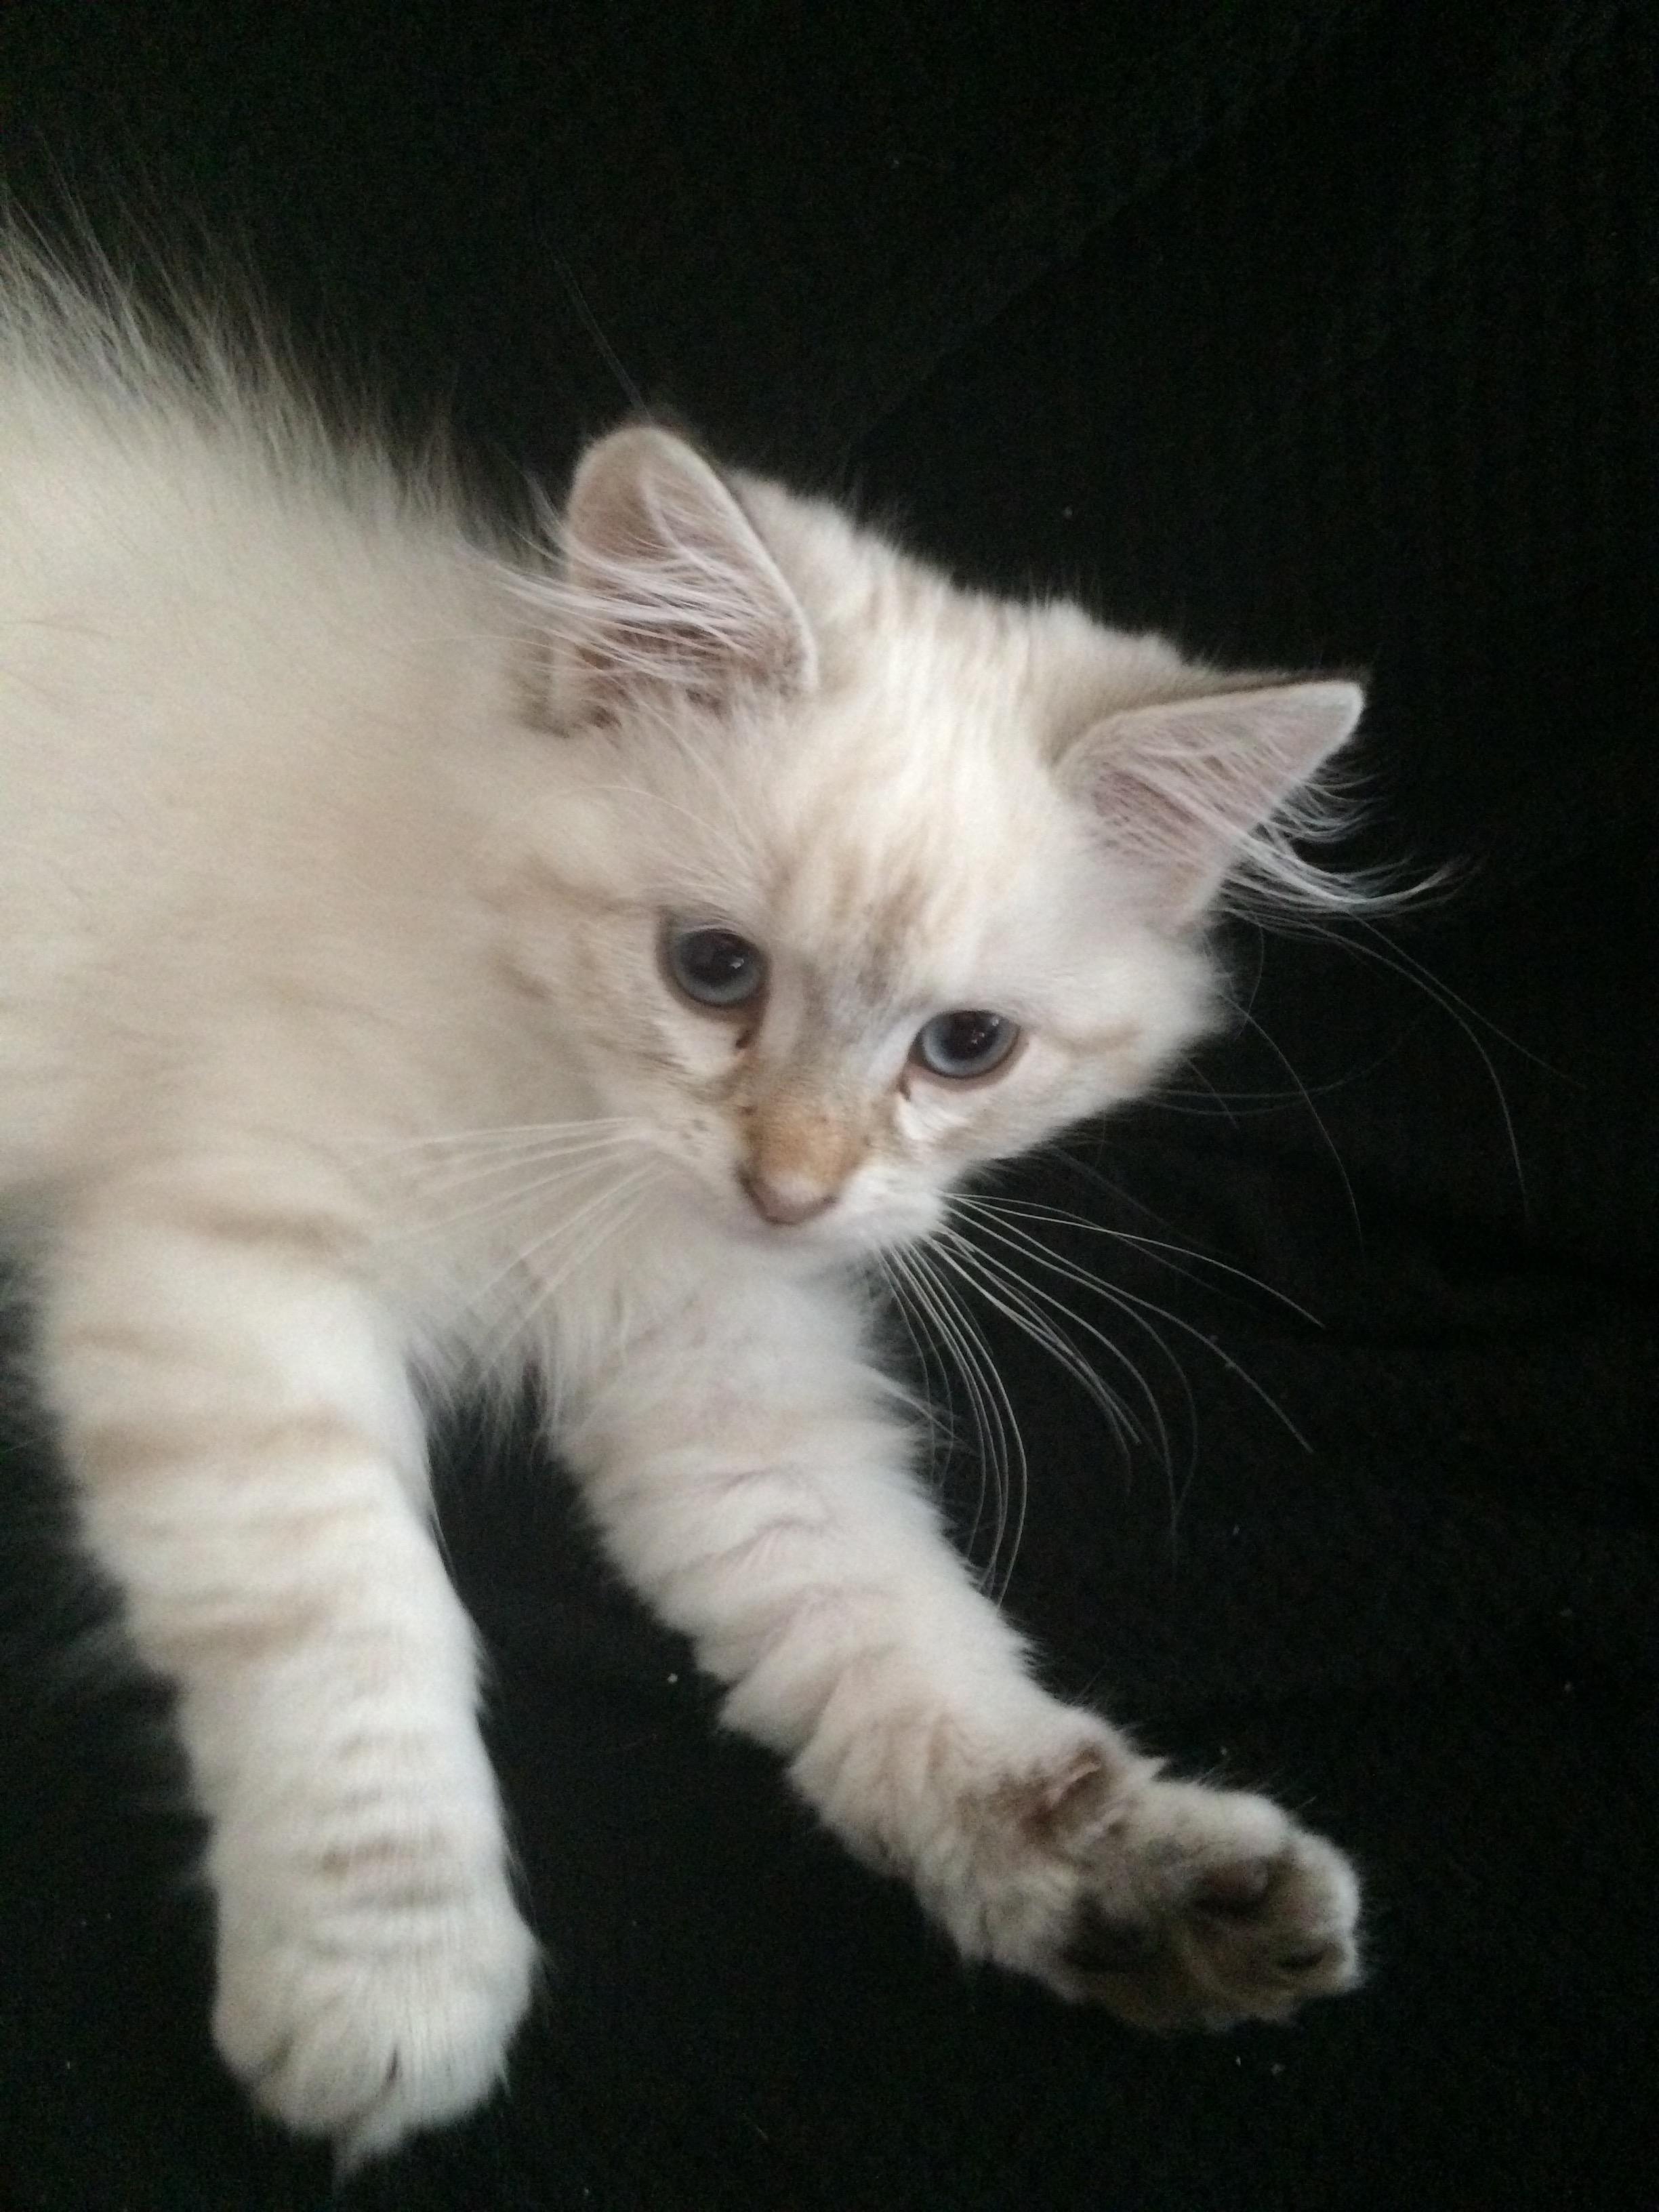 I Was Always Allergic To Cats Today I Brought Home A Hypoallergenic Siberian Cat Reddit Meet Trempette Http Ift Tt 2ctzlun Katzen